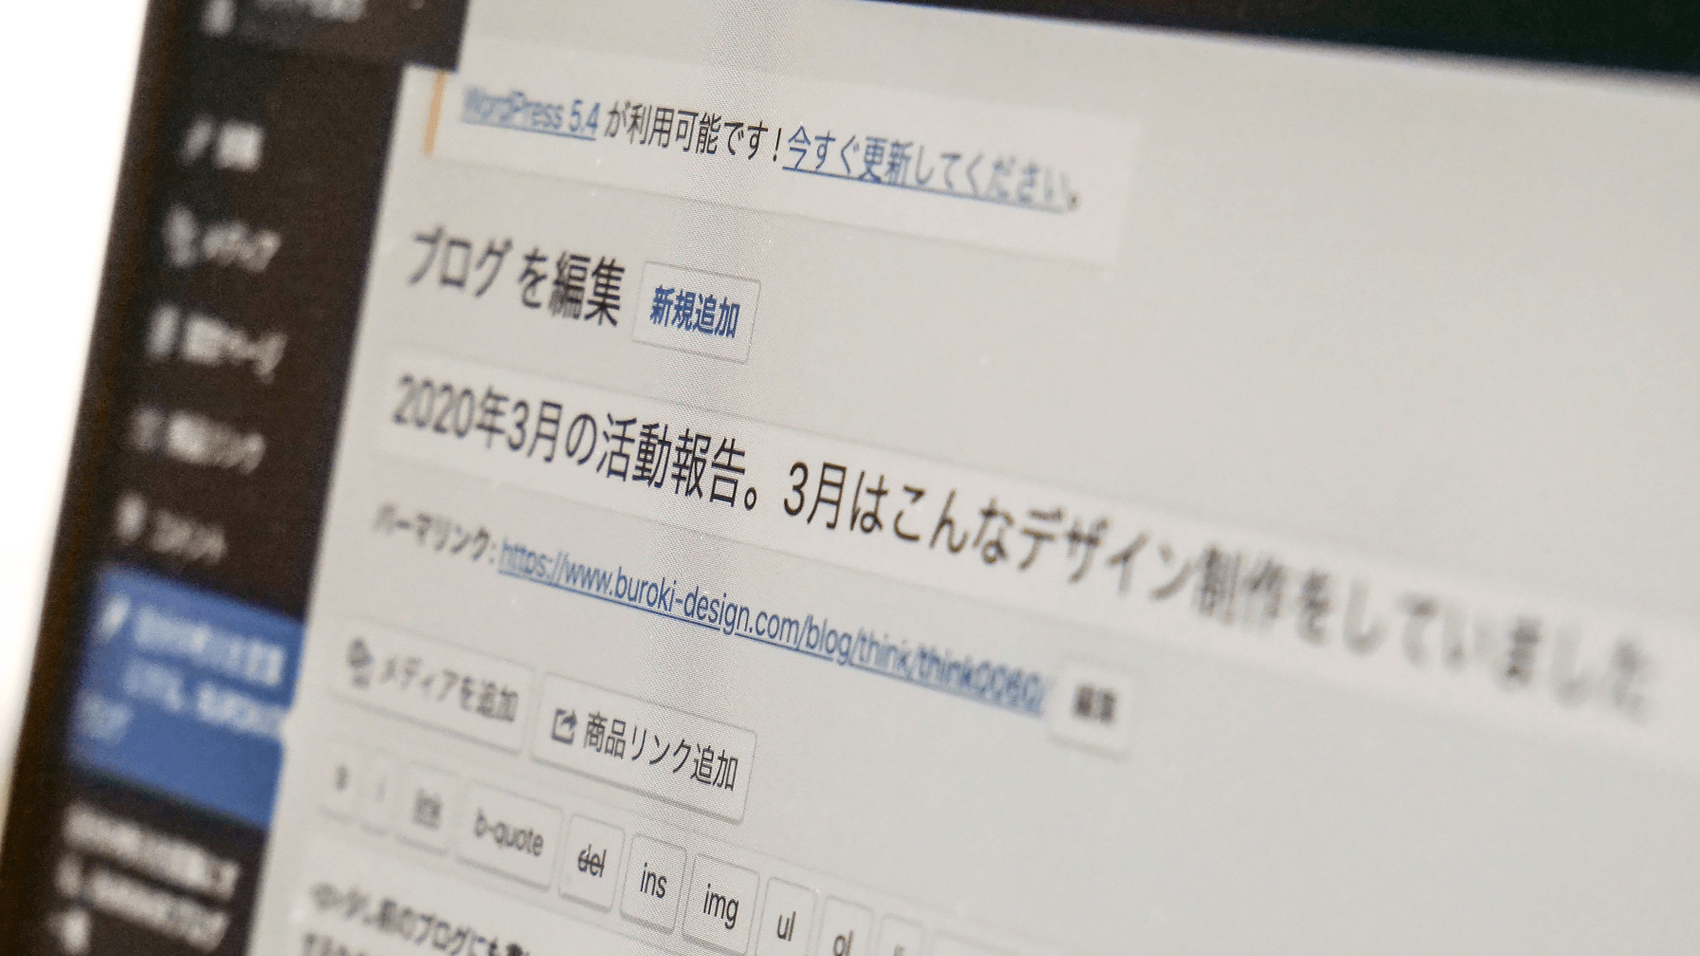 wordpressのブログ編集画面